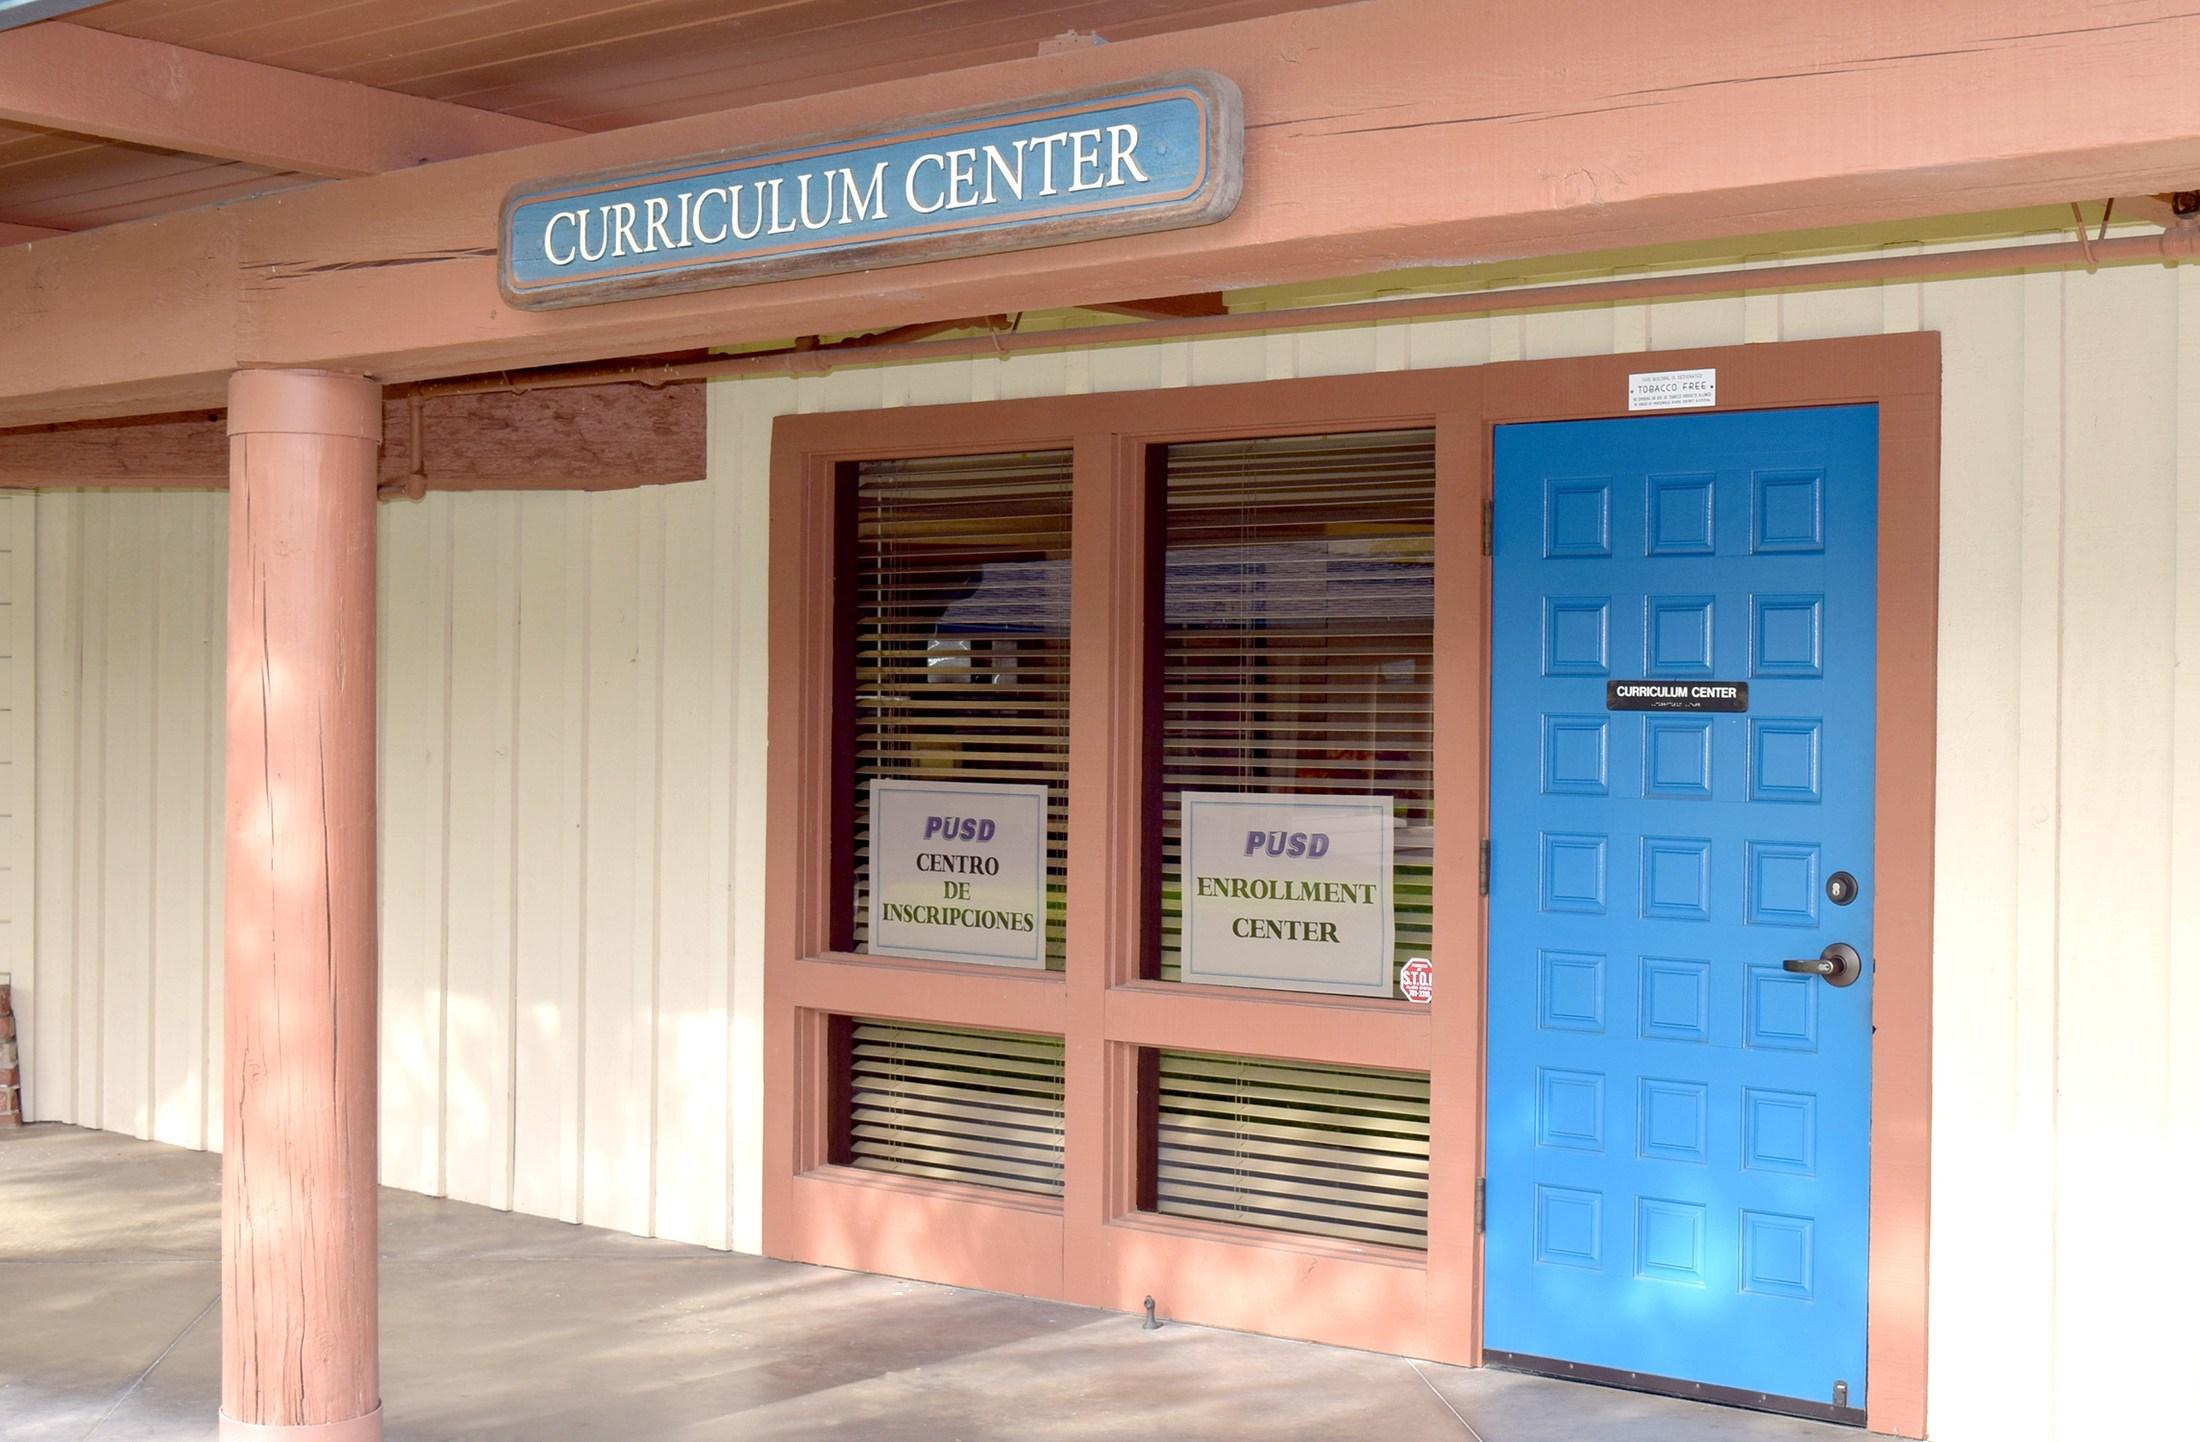 PUSD Enrollment Center